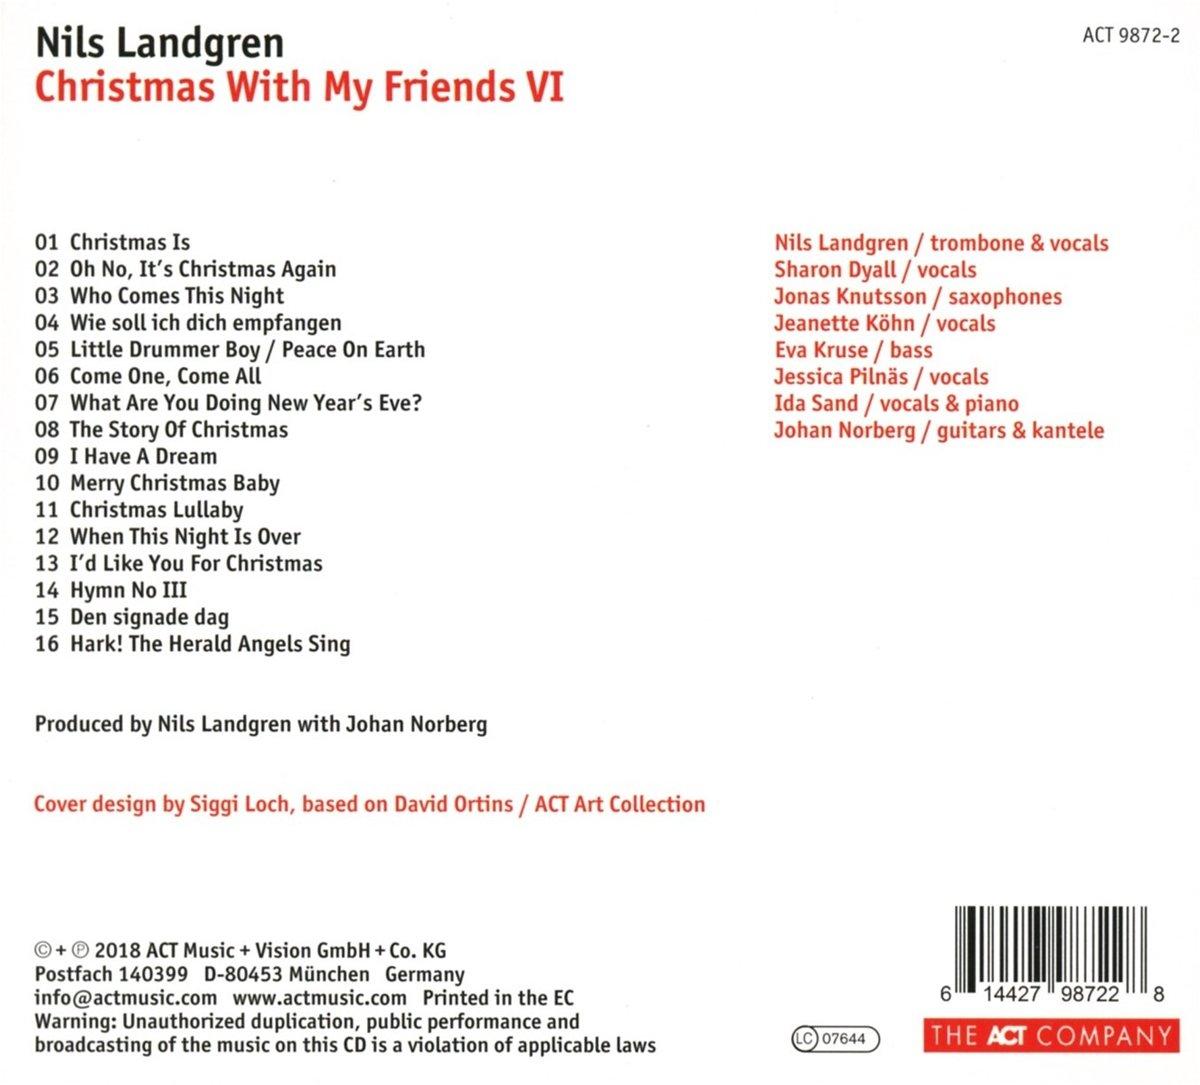 bol.com | Christmas With My Friends Vi, Nils Landgren | CD (album ...